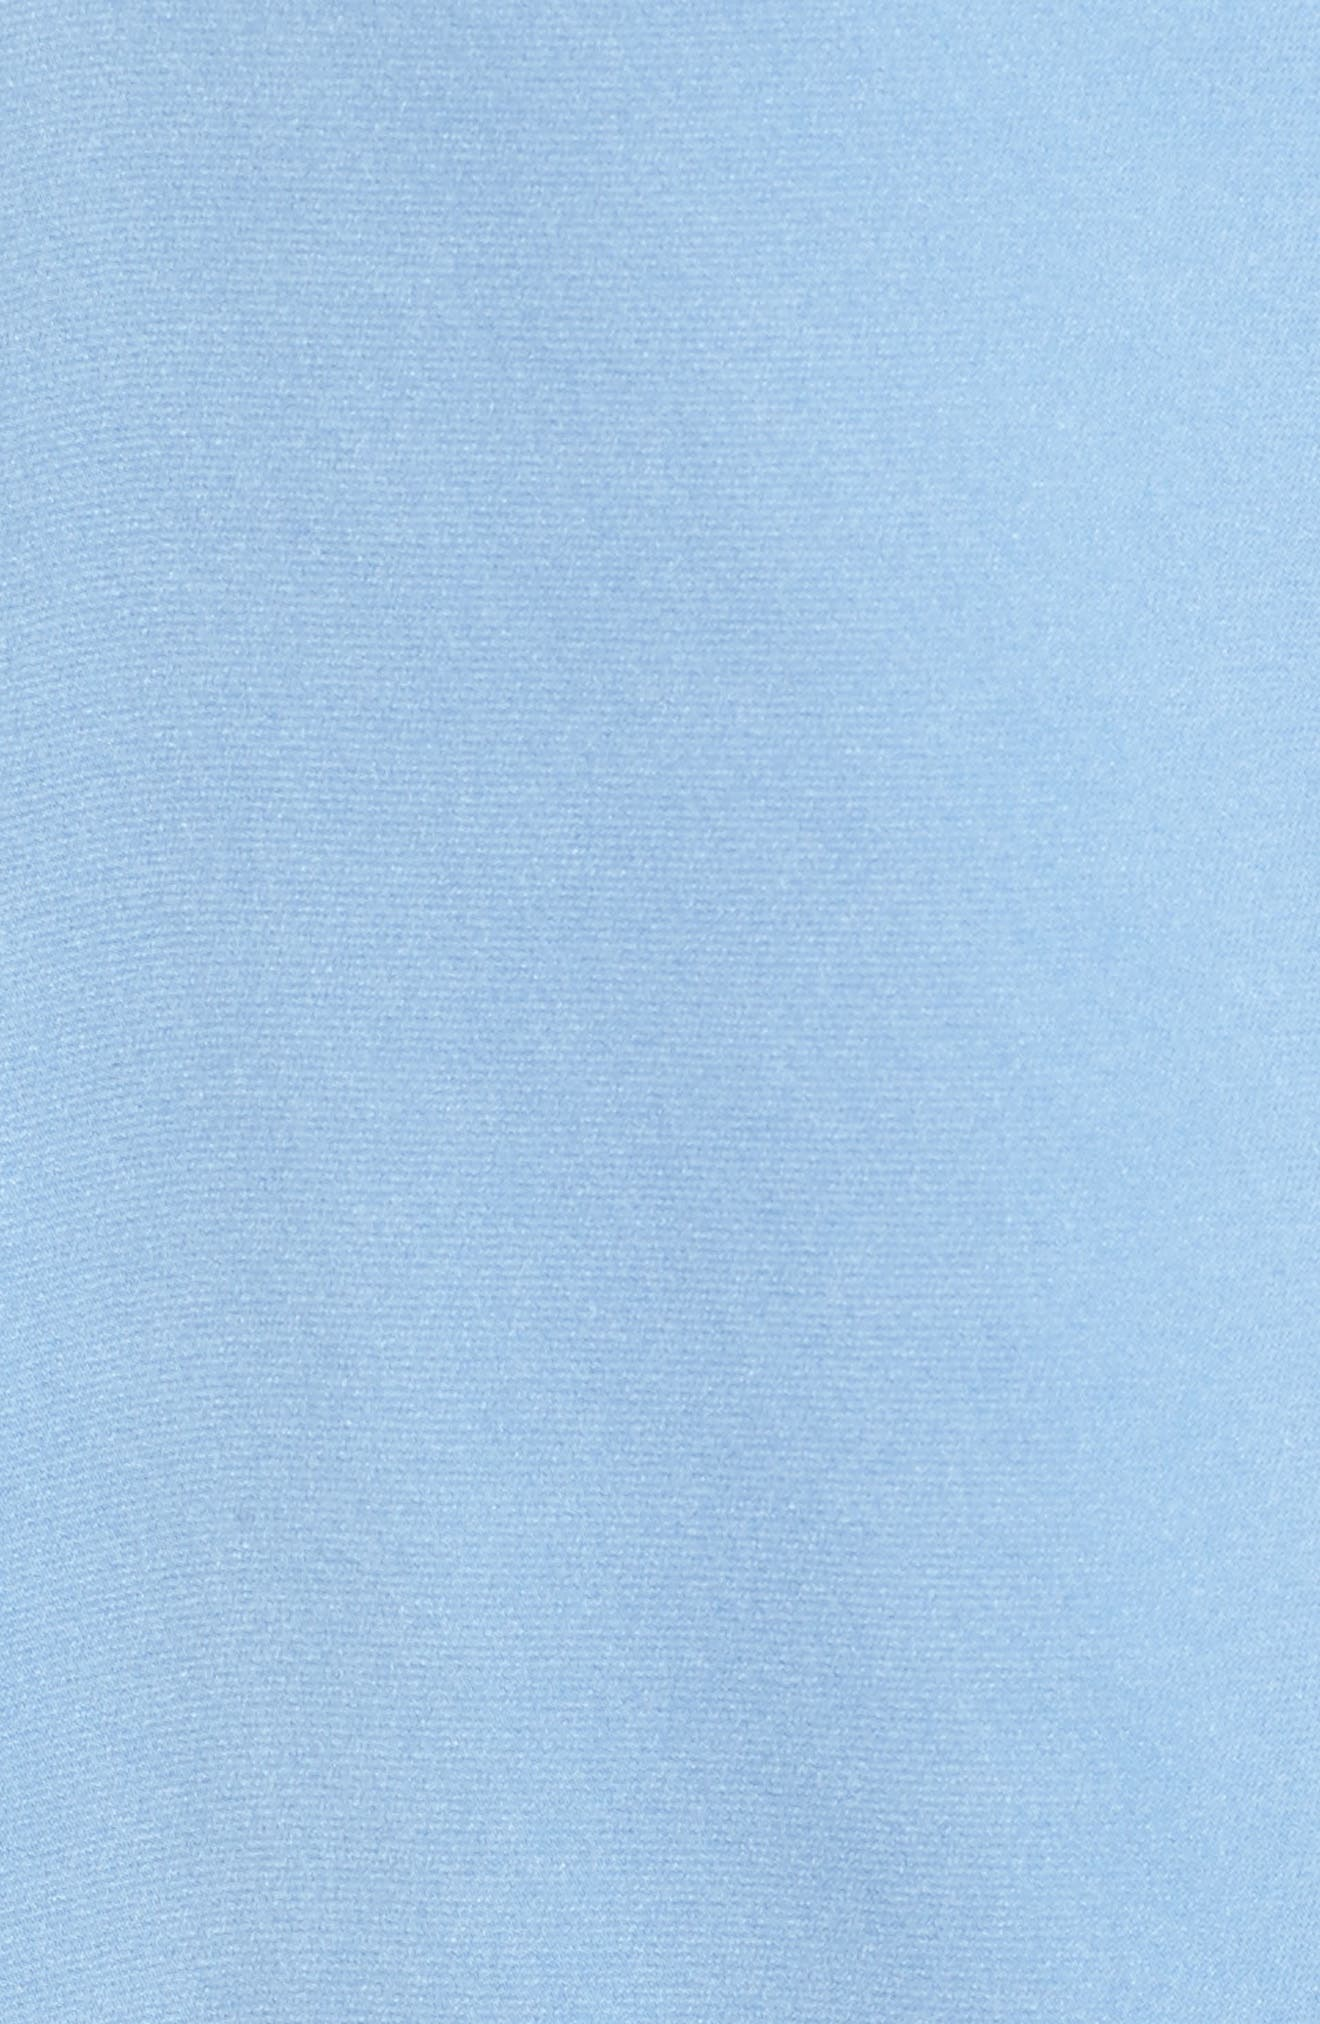 Banorana Stretch Silk Blouse,                             Alternate thumbnail 5, color,                             Blue Sky